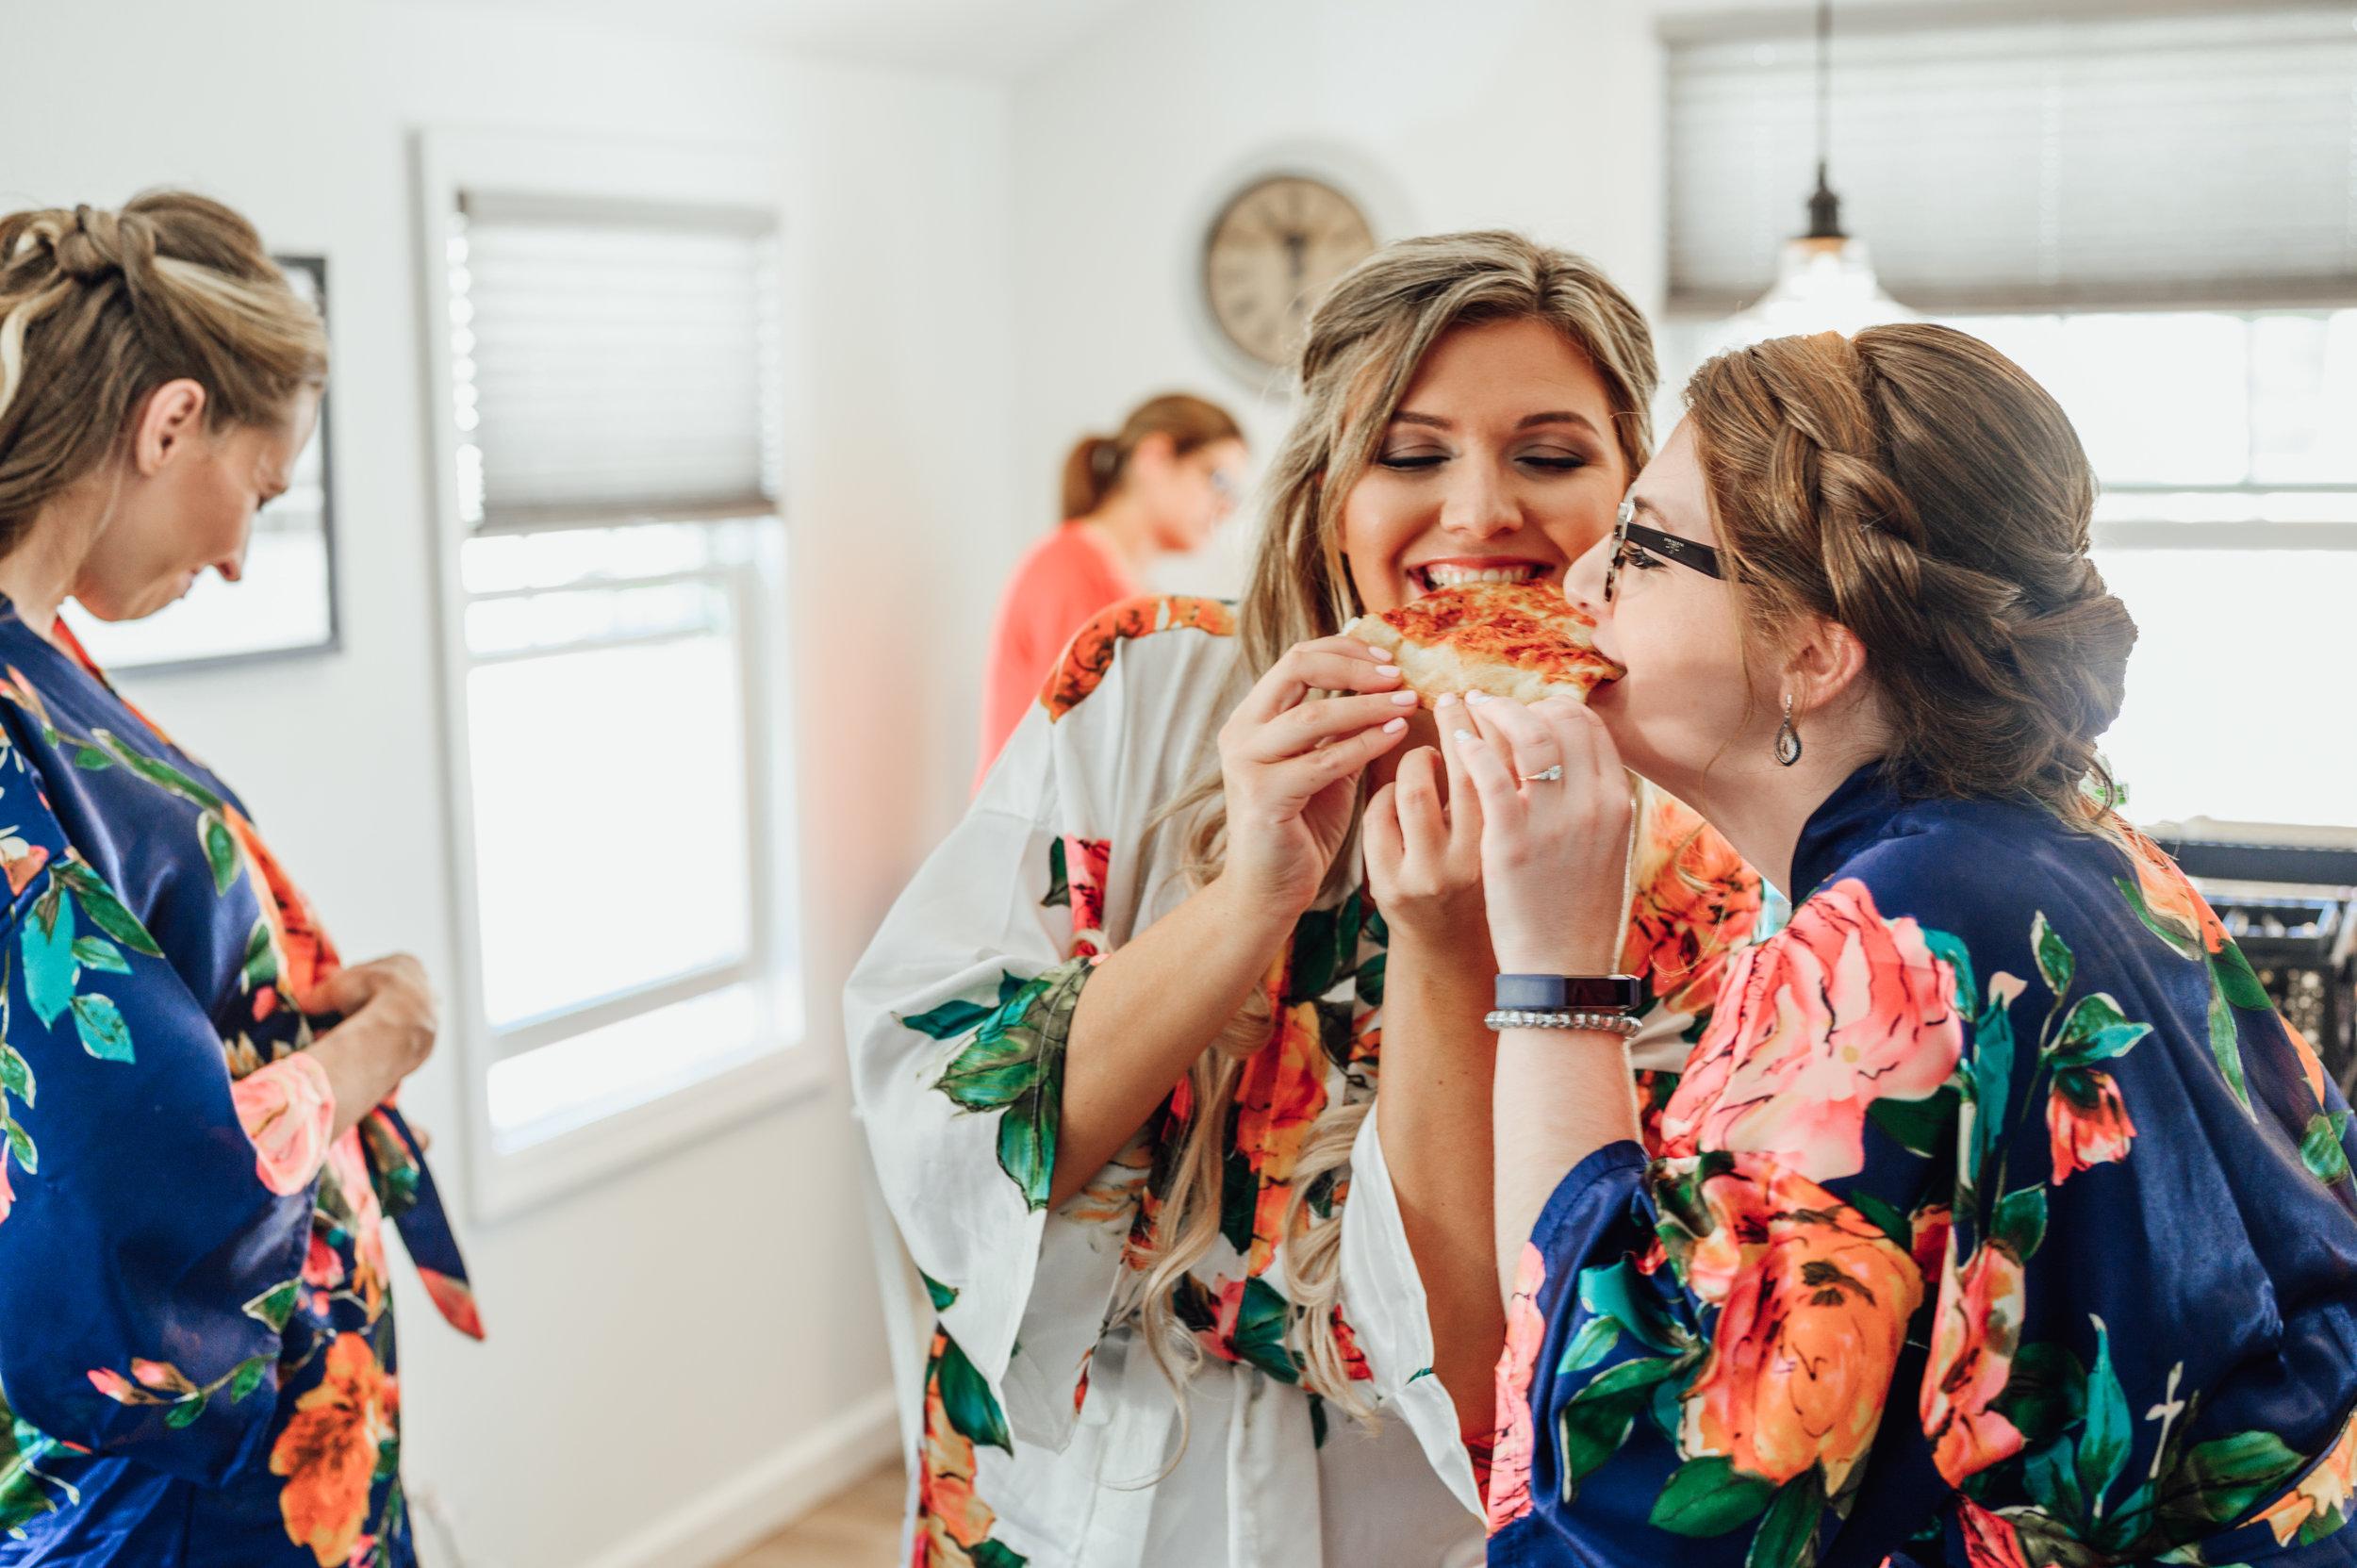 New Jersey Wedding Photographer, Felsberg Photography LBI wedding photography 8.jpg